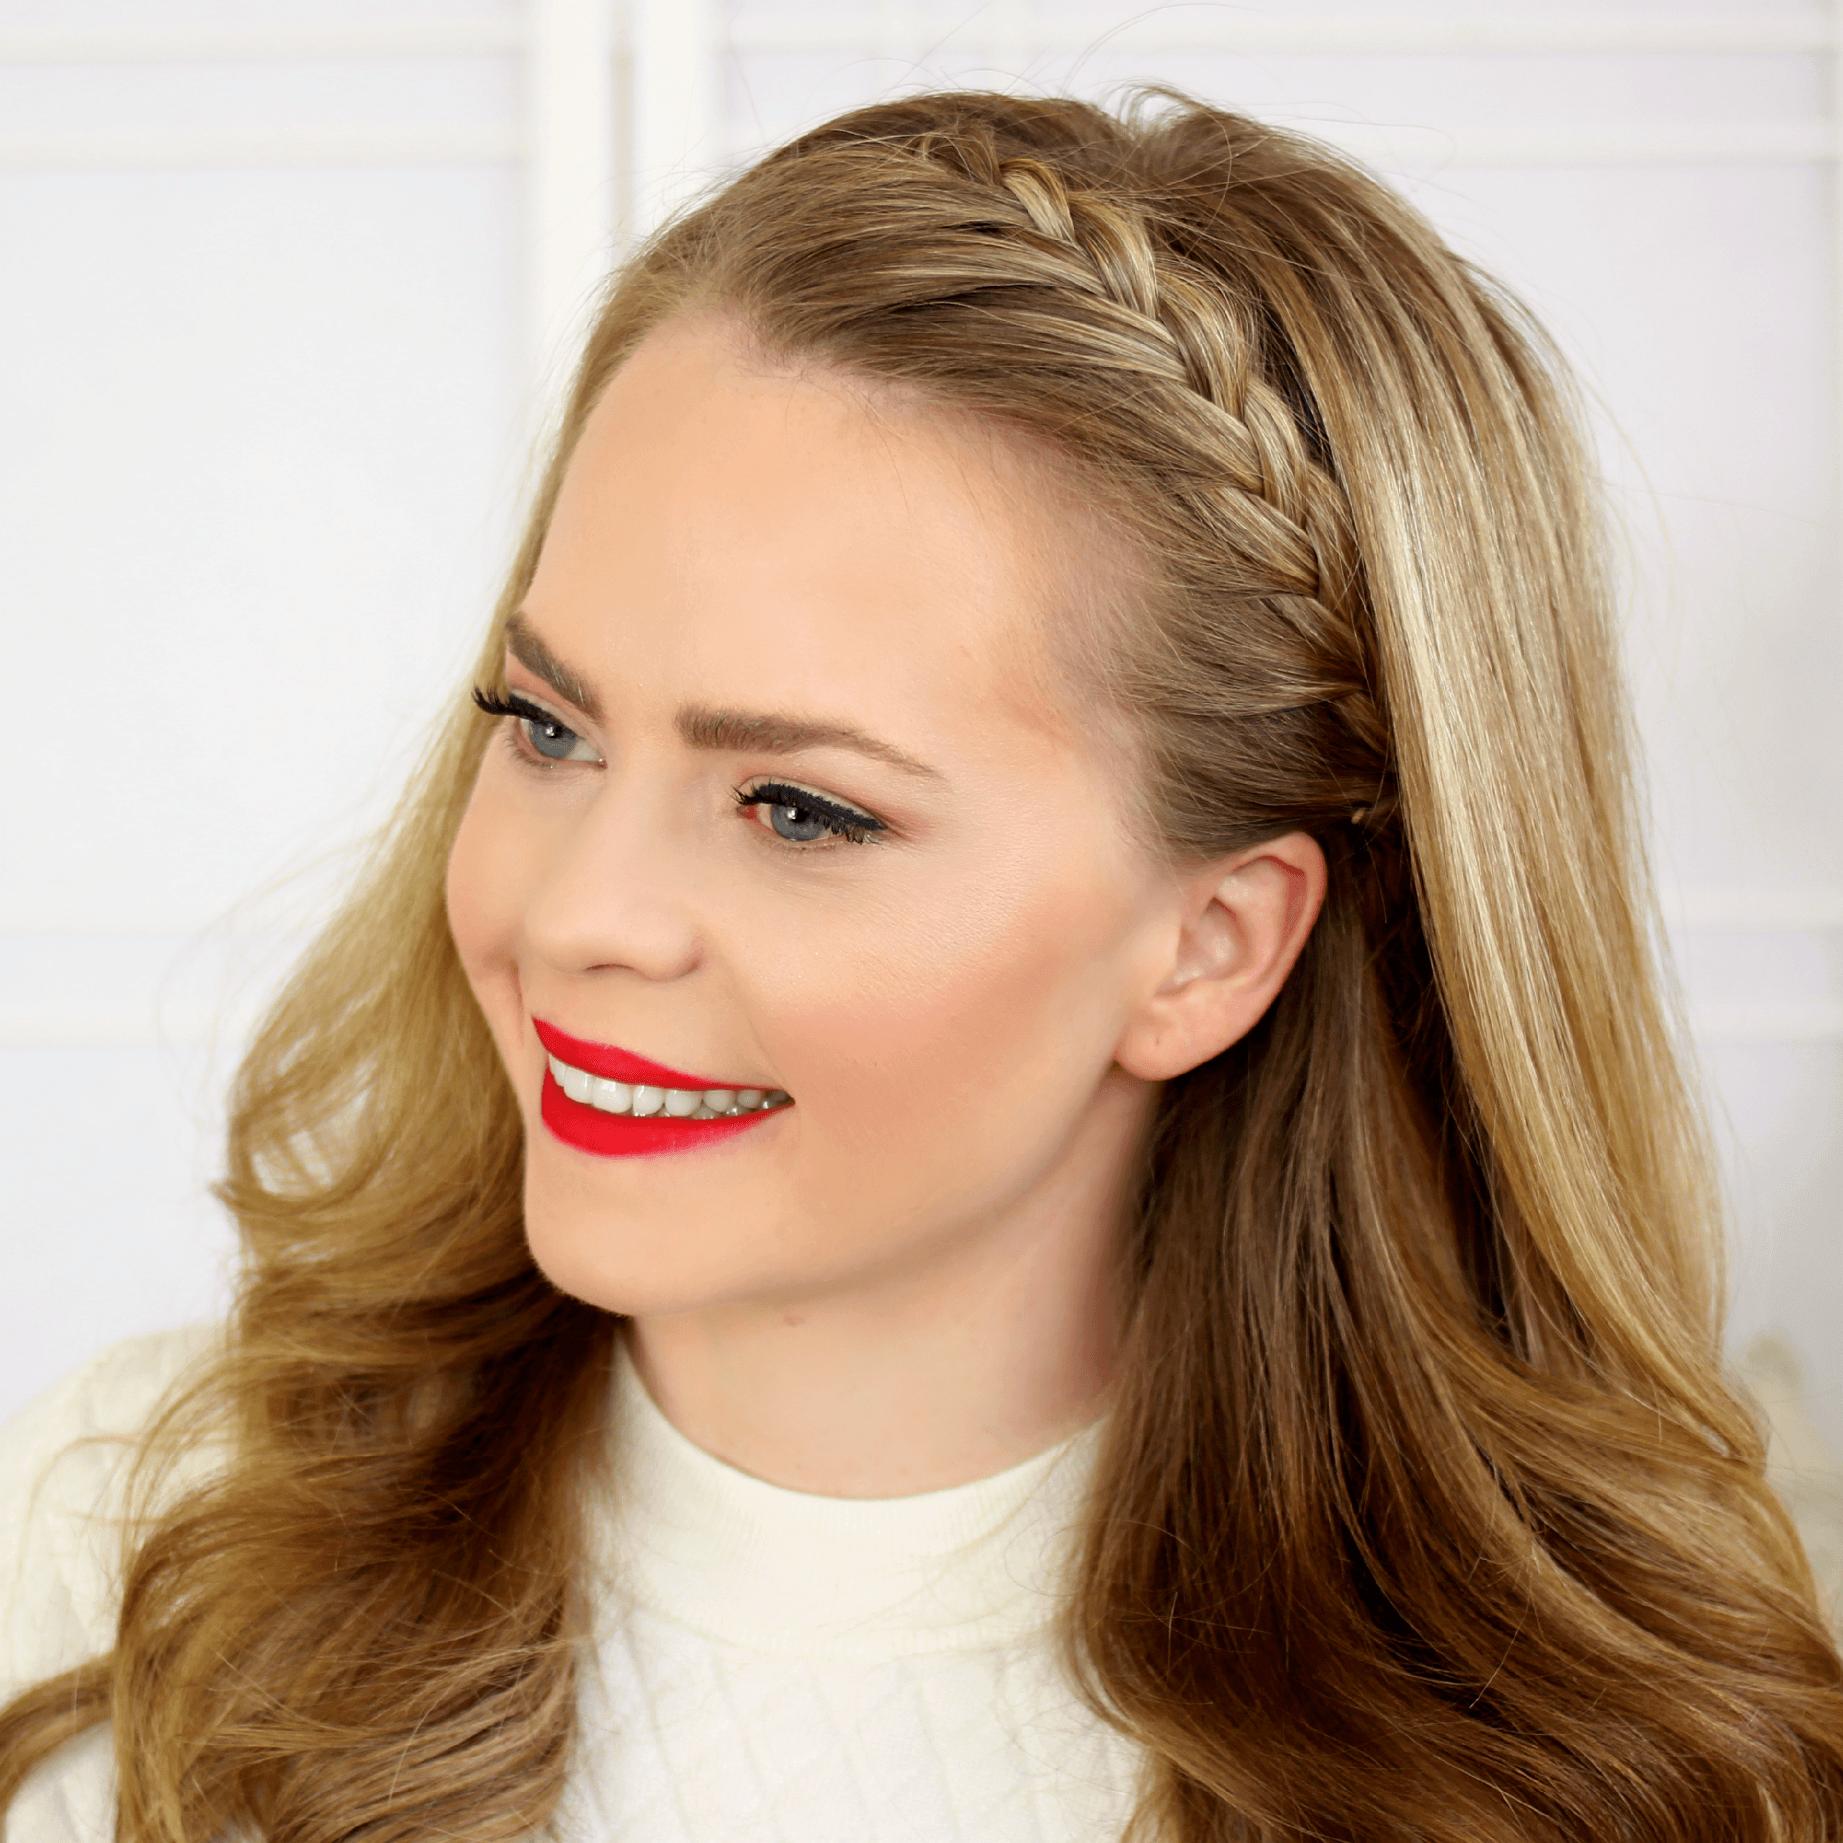 Lace Headband Braid | MISSY SUE